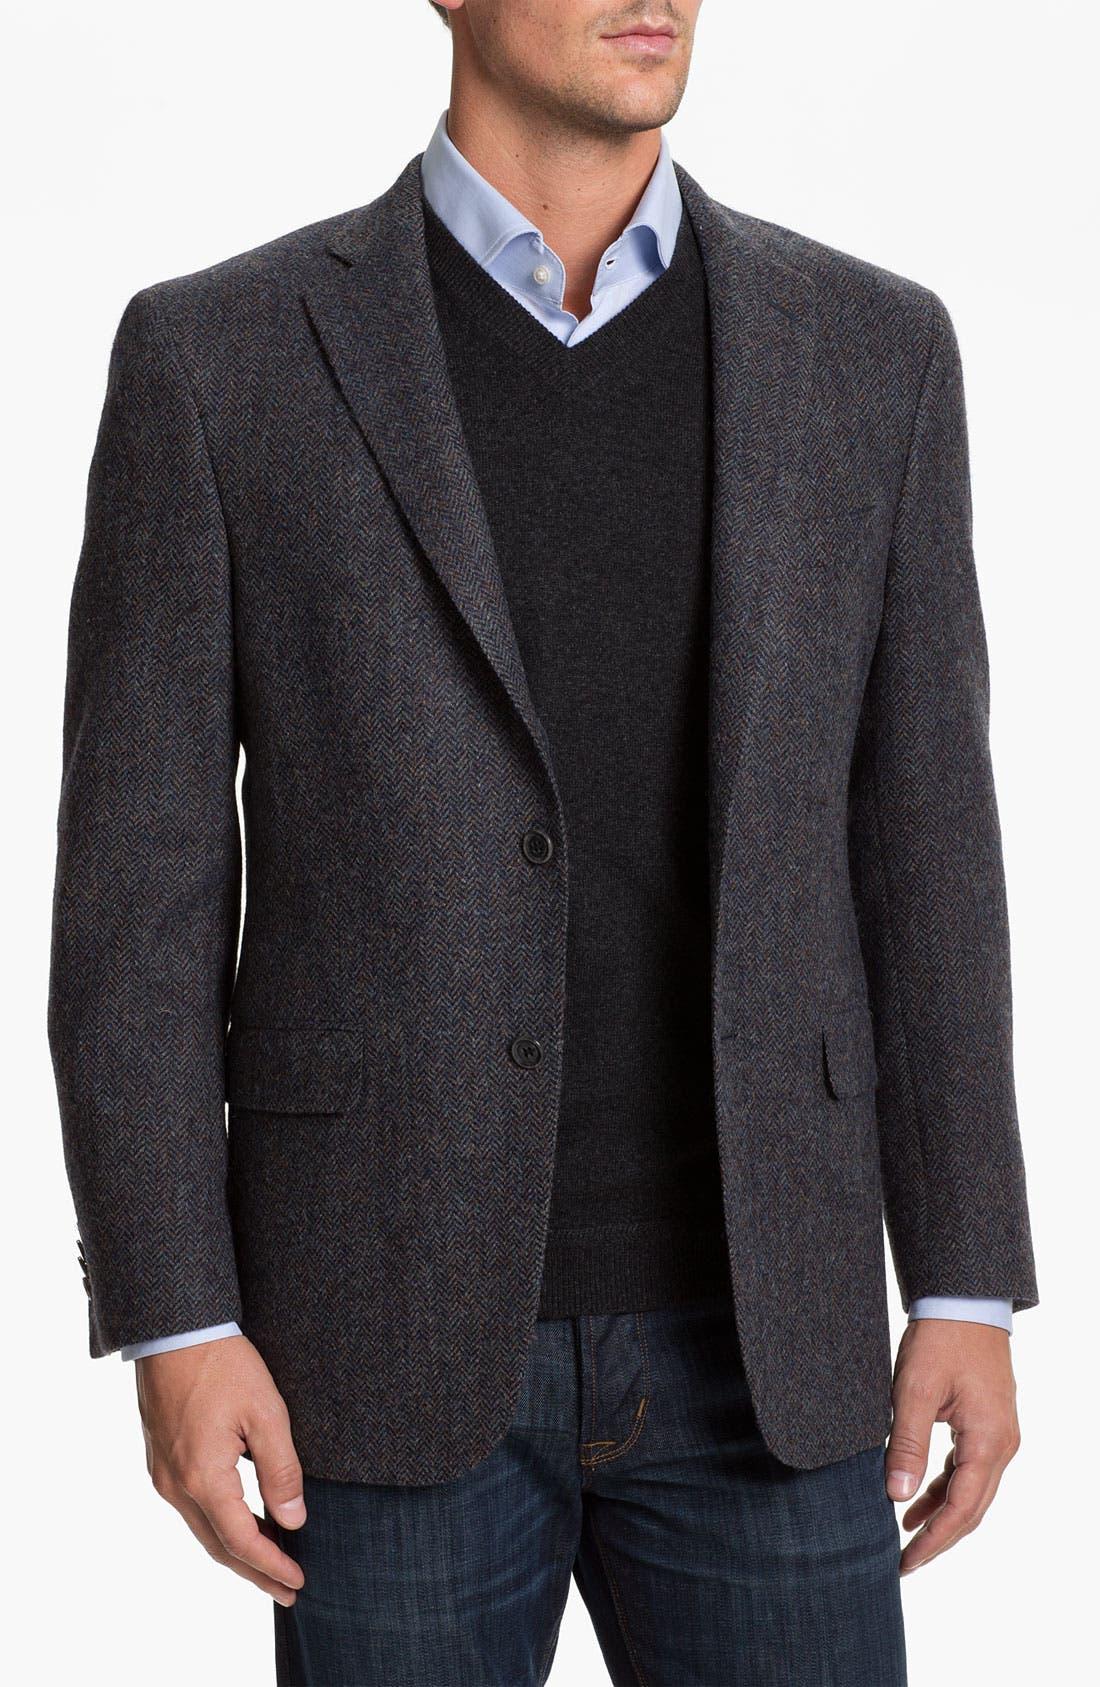 Alternate Image 1 Selected - Hart Schaffner Marx Herringbone Sportcoat